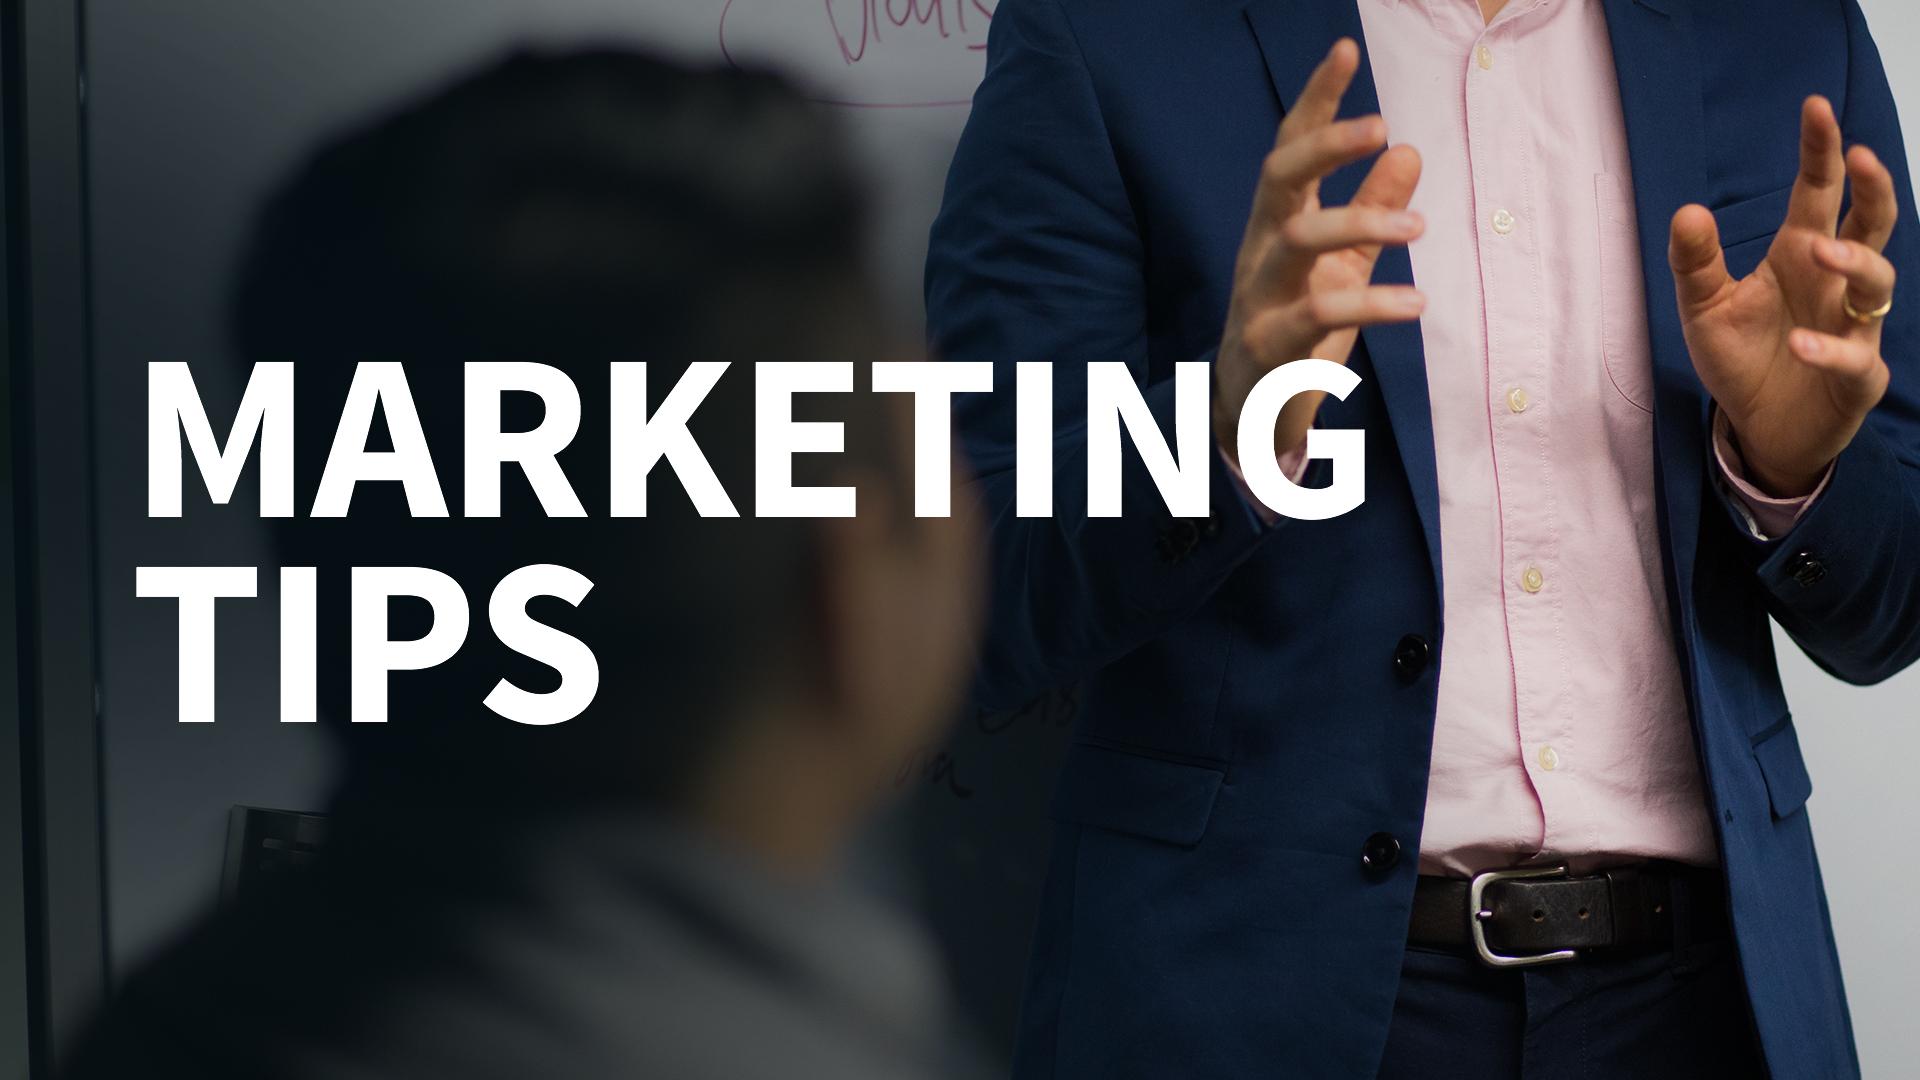 The 17 minute SEO: Marketing Tips